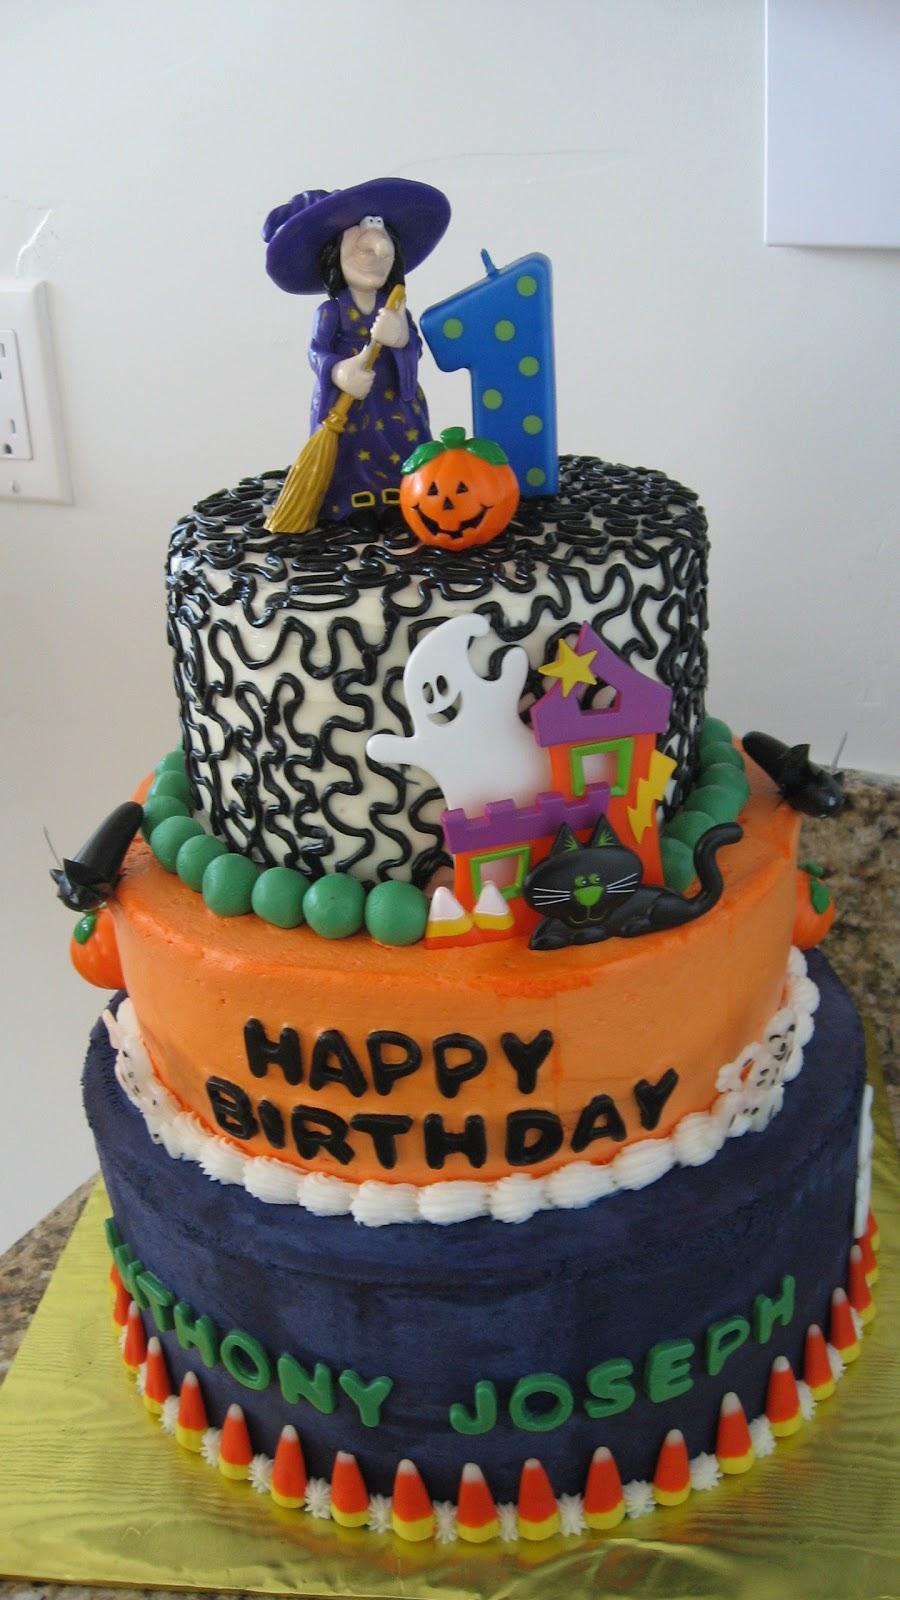 Cake Decorating Halloween Theme : Birthday Cake Center: Halloween Birthday Cakes 2011 ...